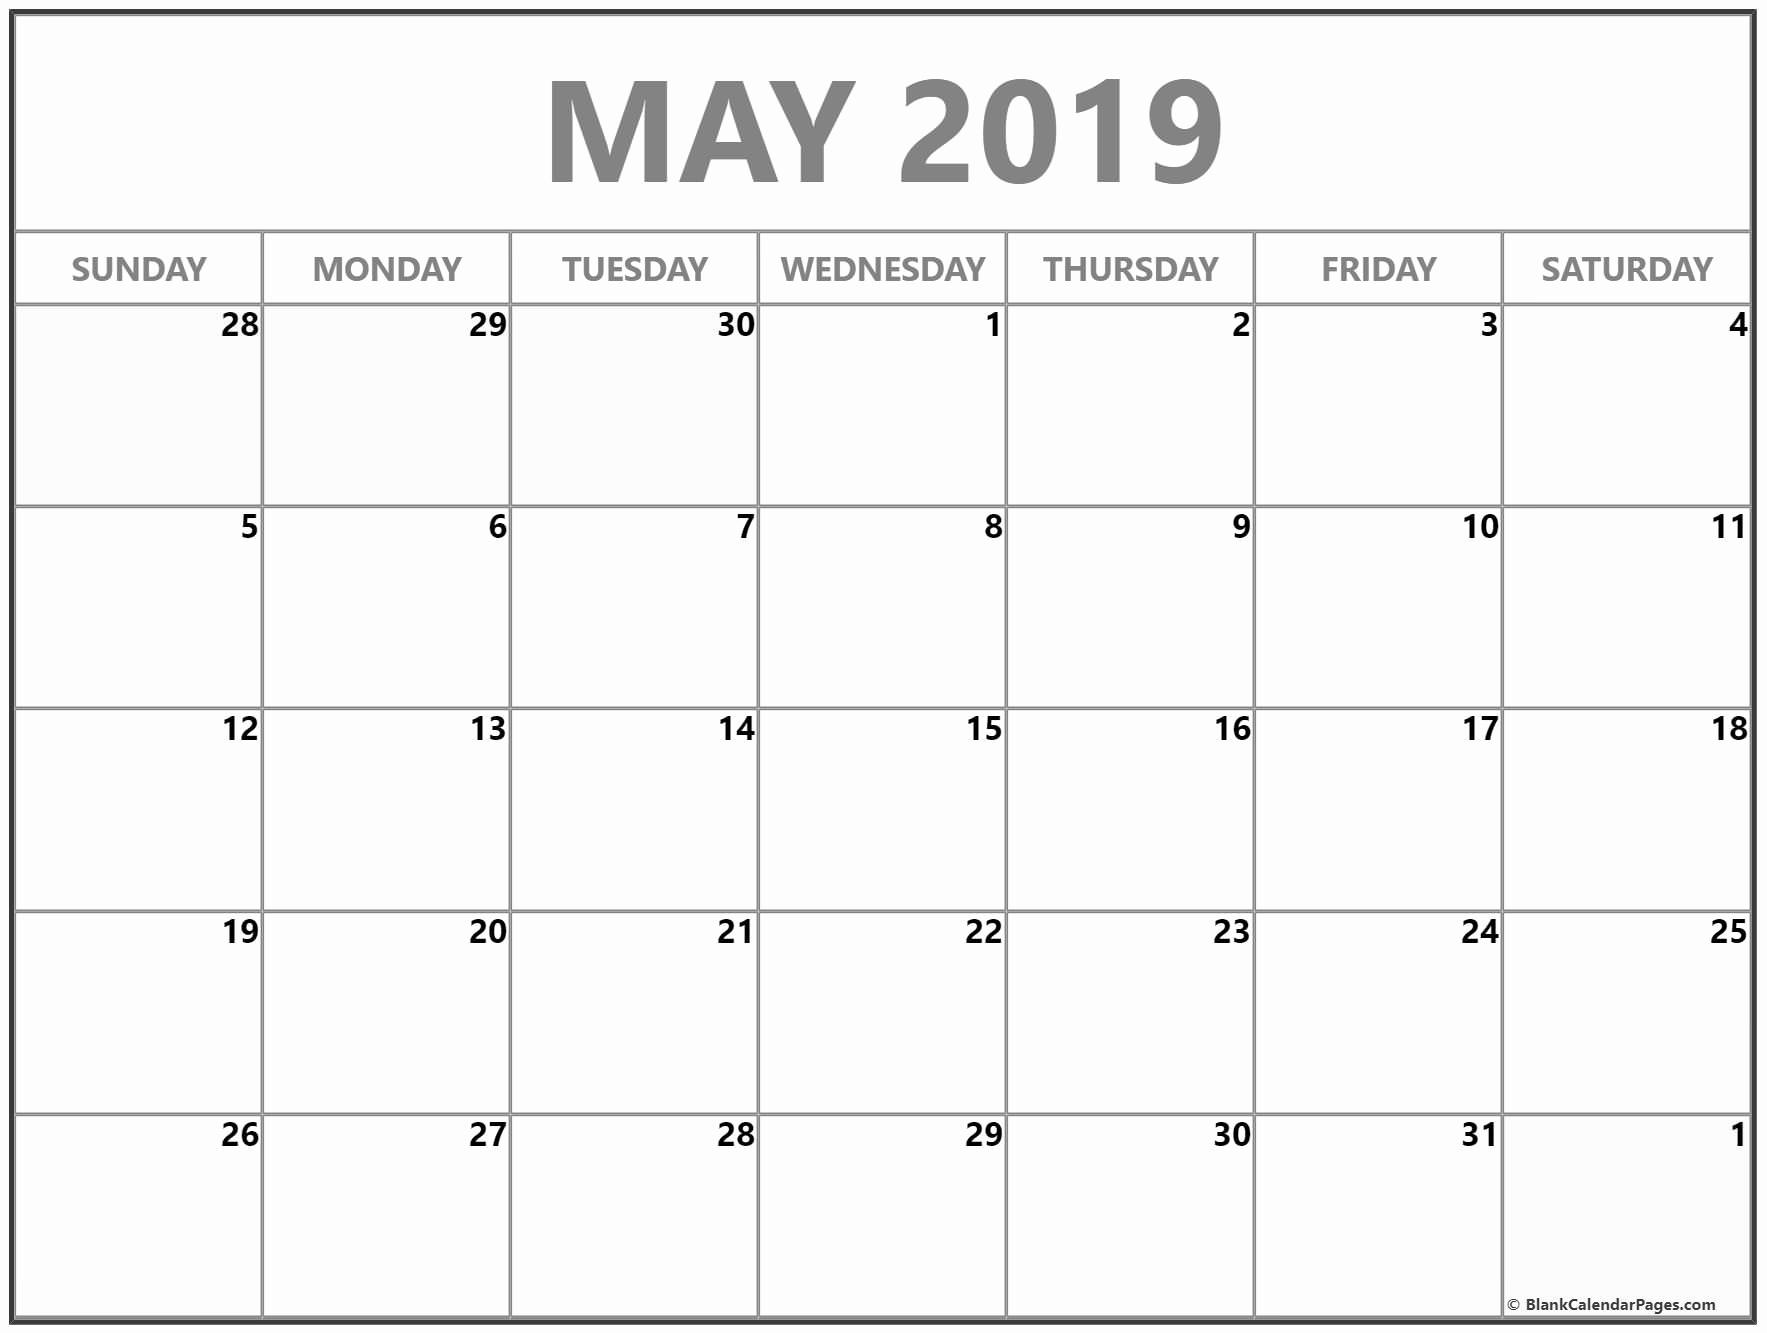 Blank Calendar Template 2019 Elegant May 2019 Blank Calendar Templates